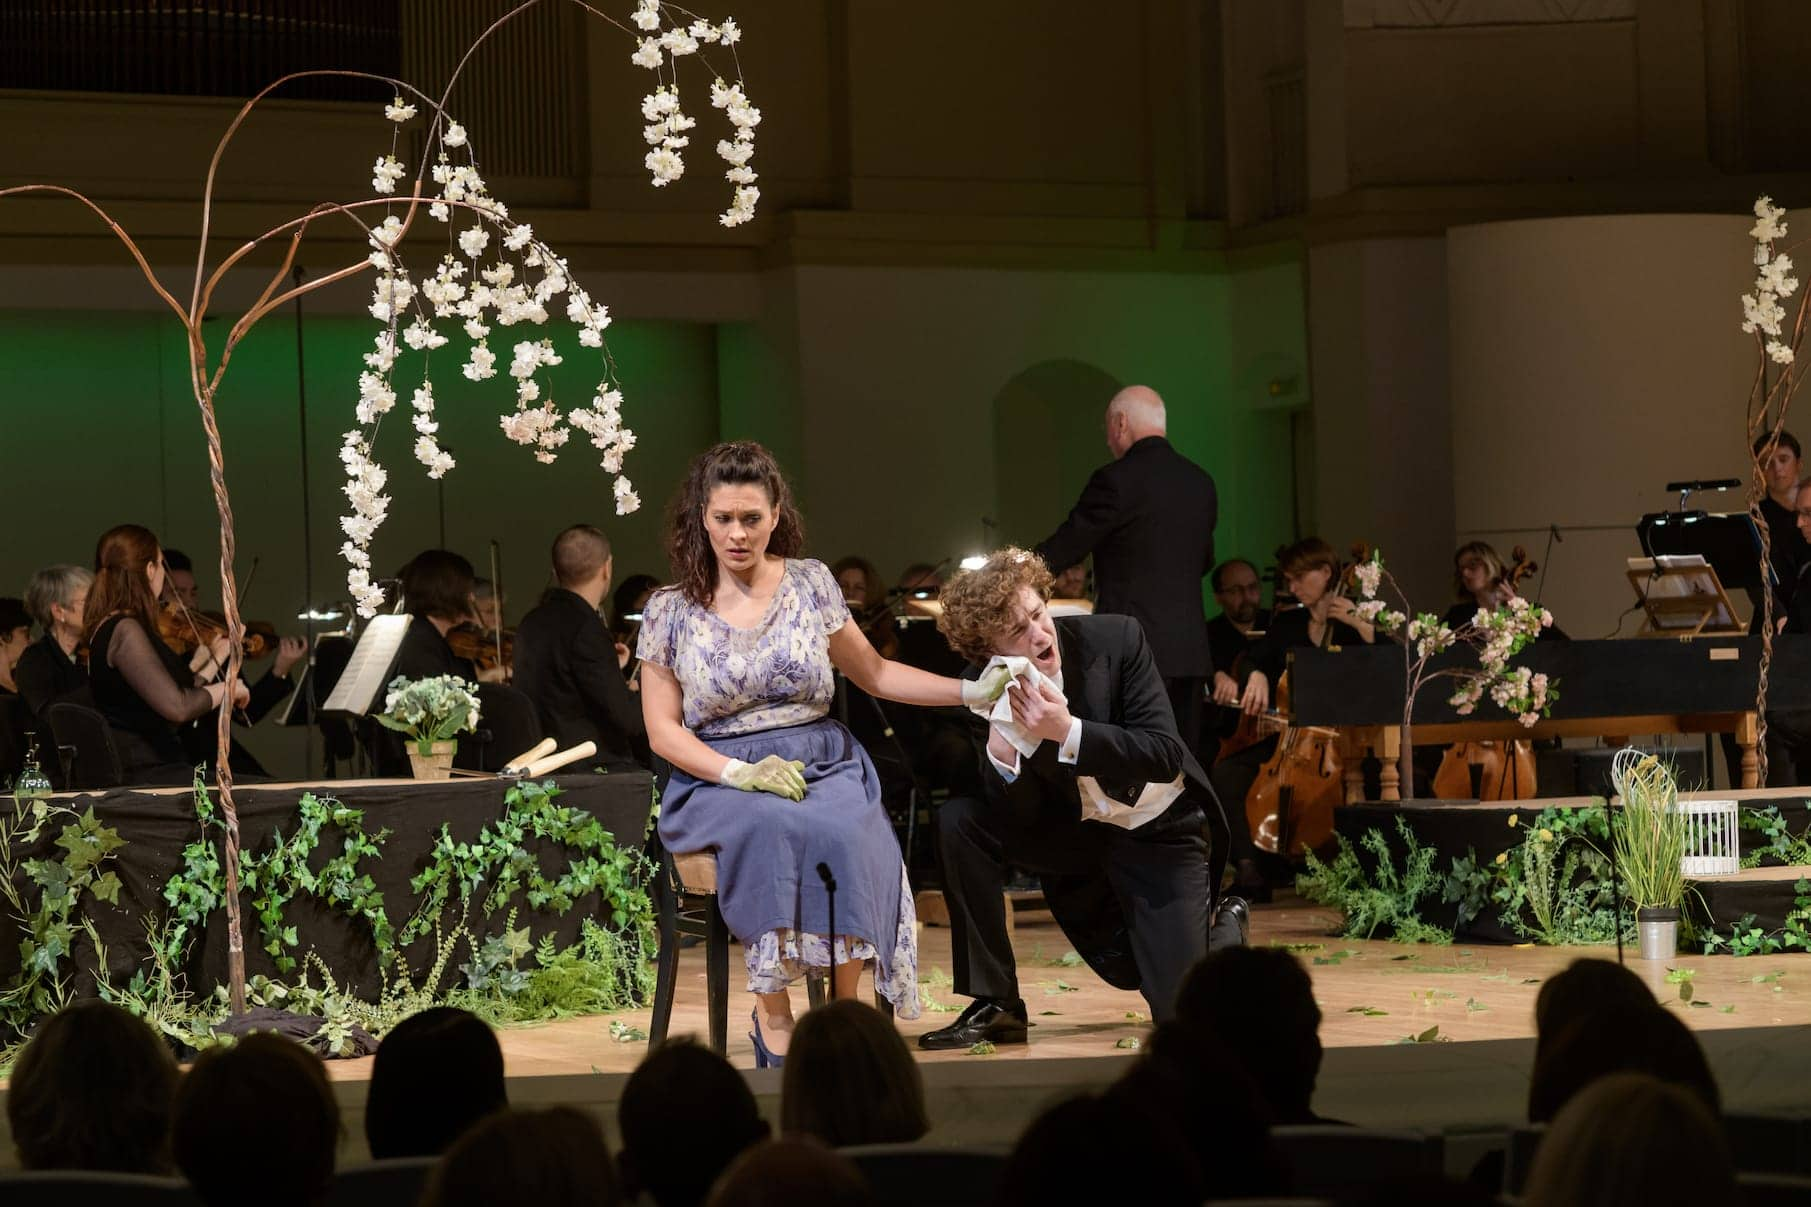 Опера Моцарта «Мнимая садовница». Виоланте - Мариасоле Майнини, Анкизе - Рори Кавер. Фото - пресс-служба МГАФ